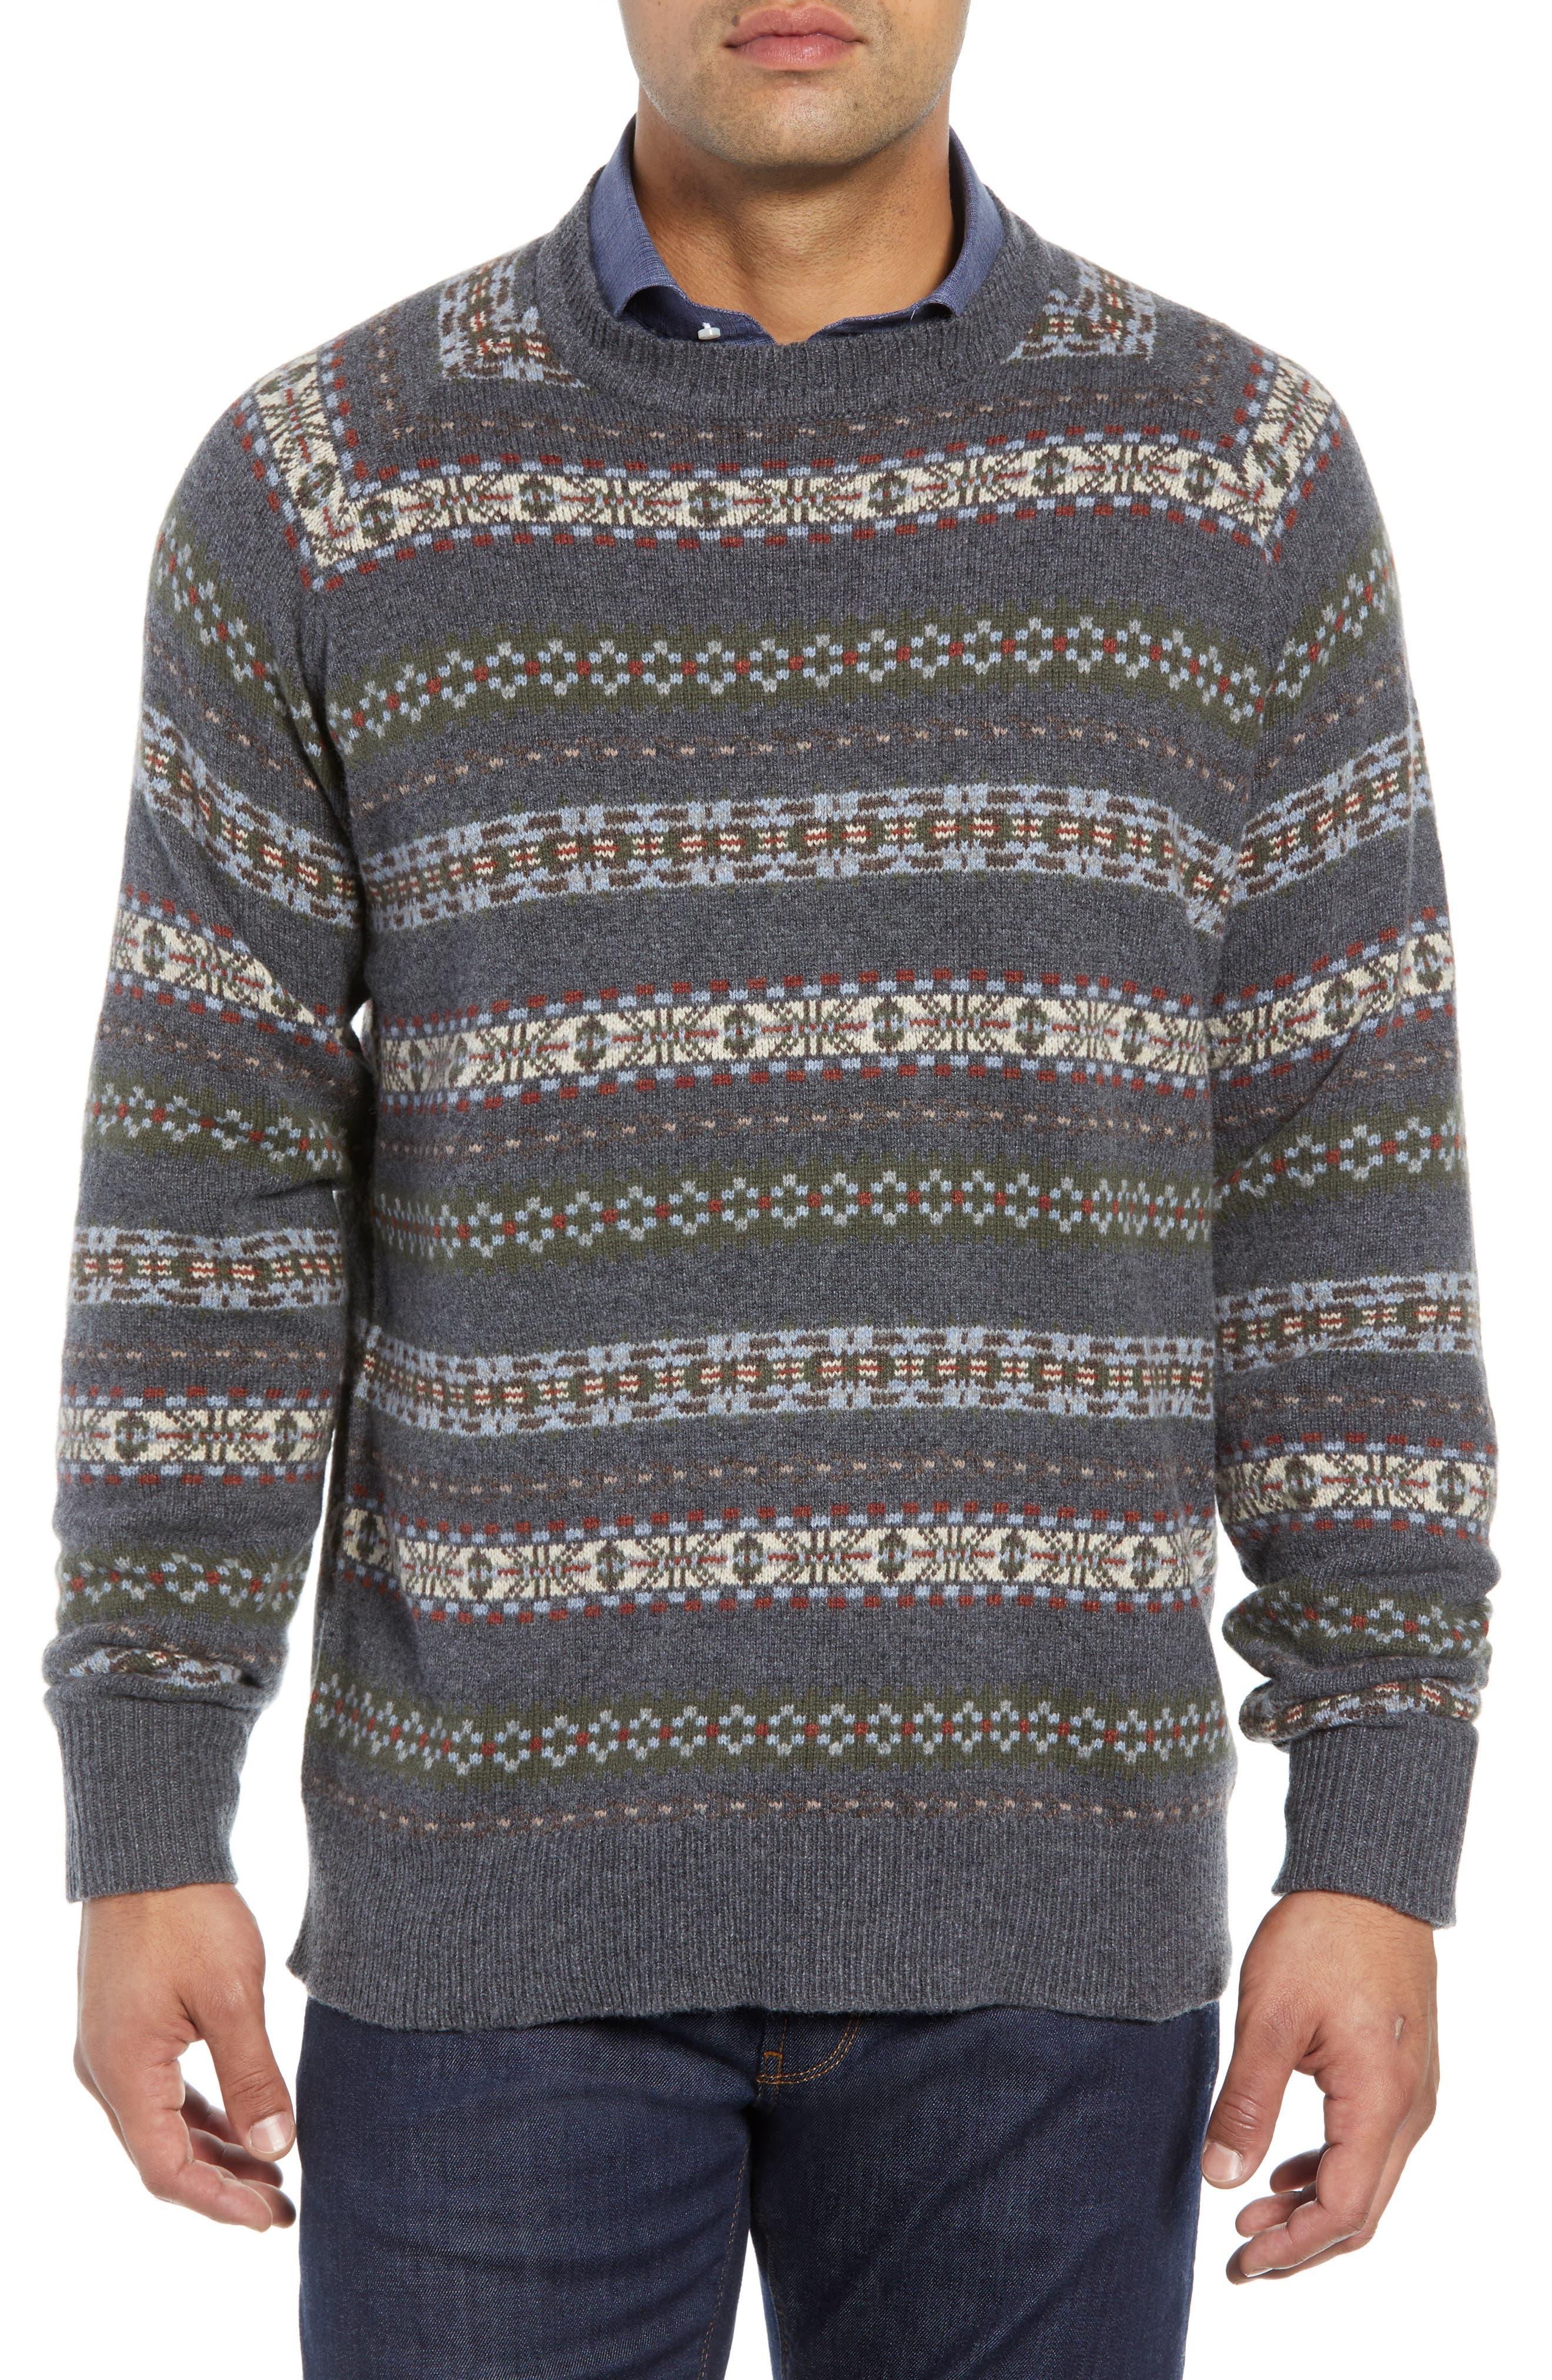 Mountainside Fair Isle Crewneck Sweater,                             Main thumbnail 1, color,                             017